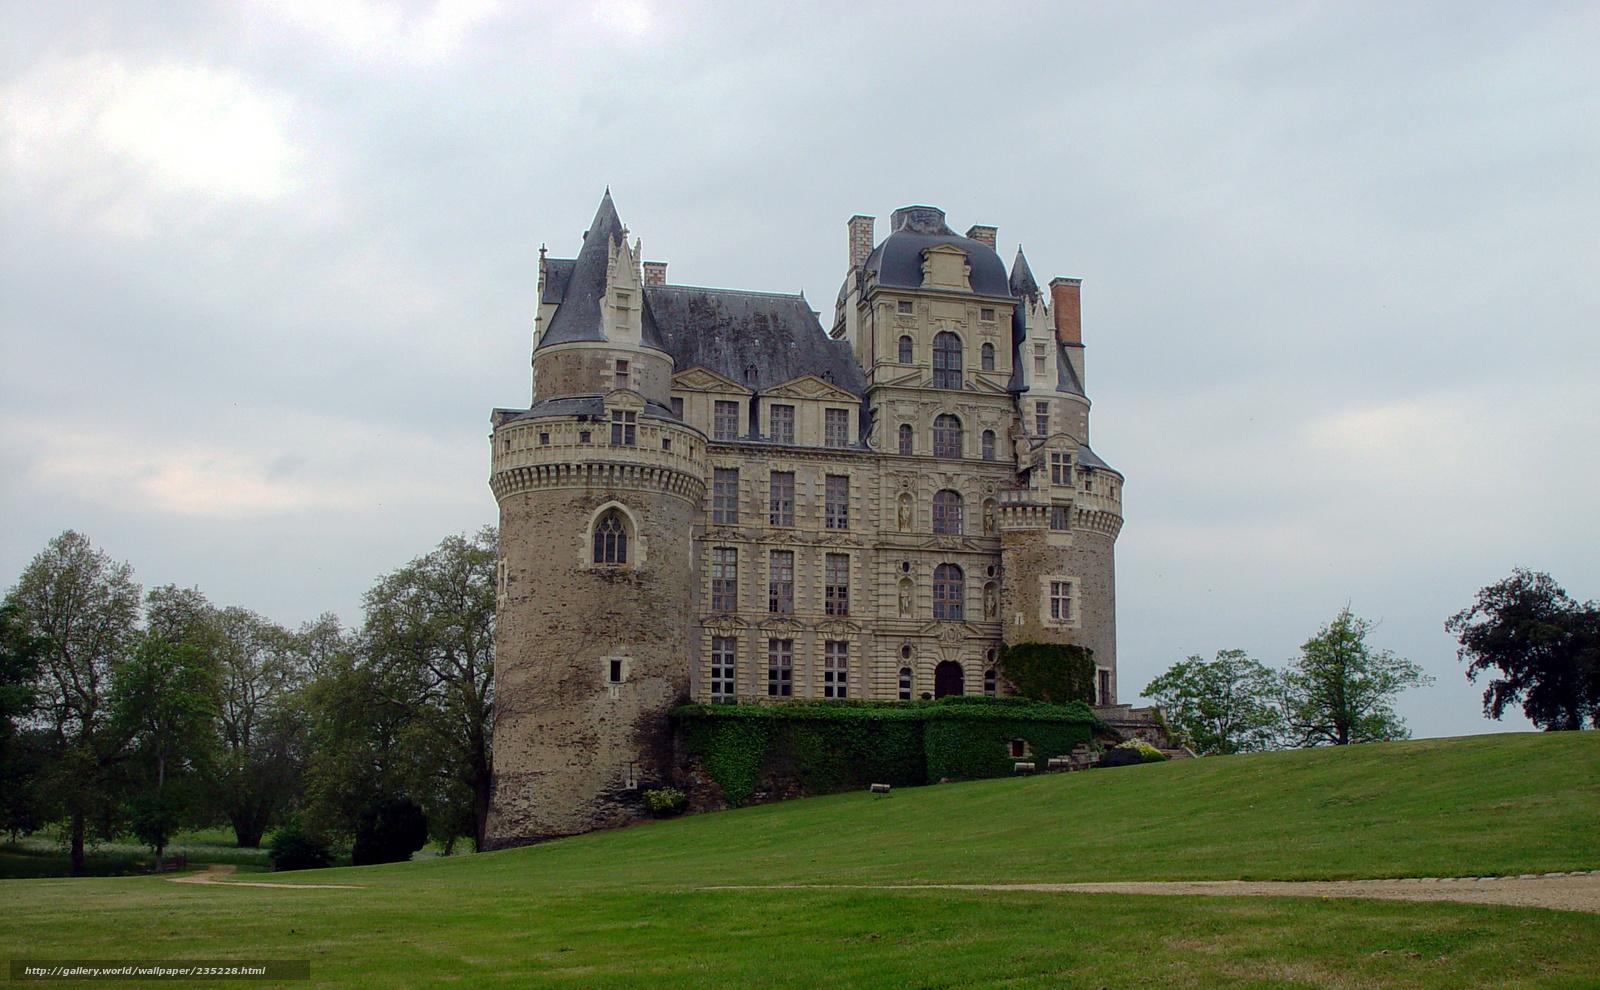 castle wallpaper nice france - photo #7